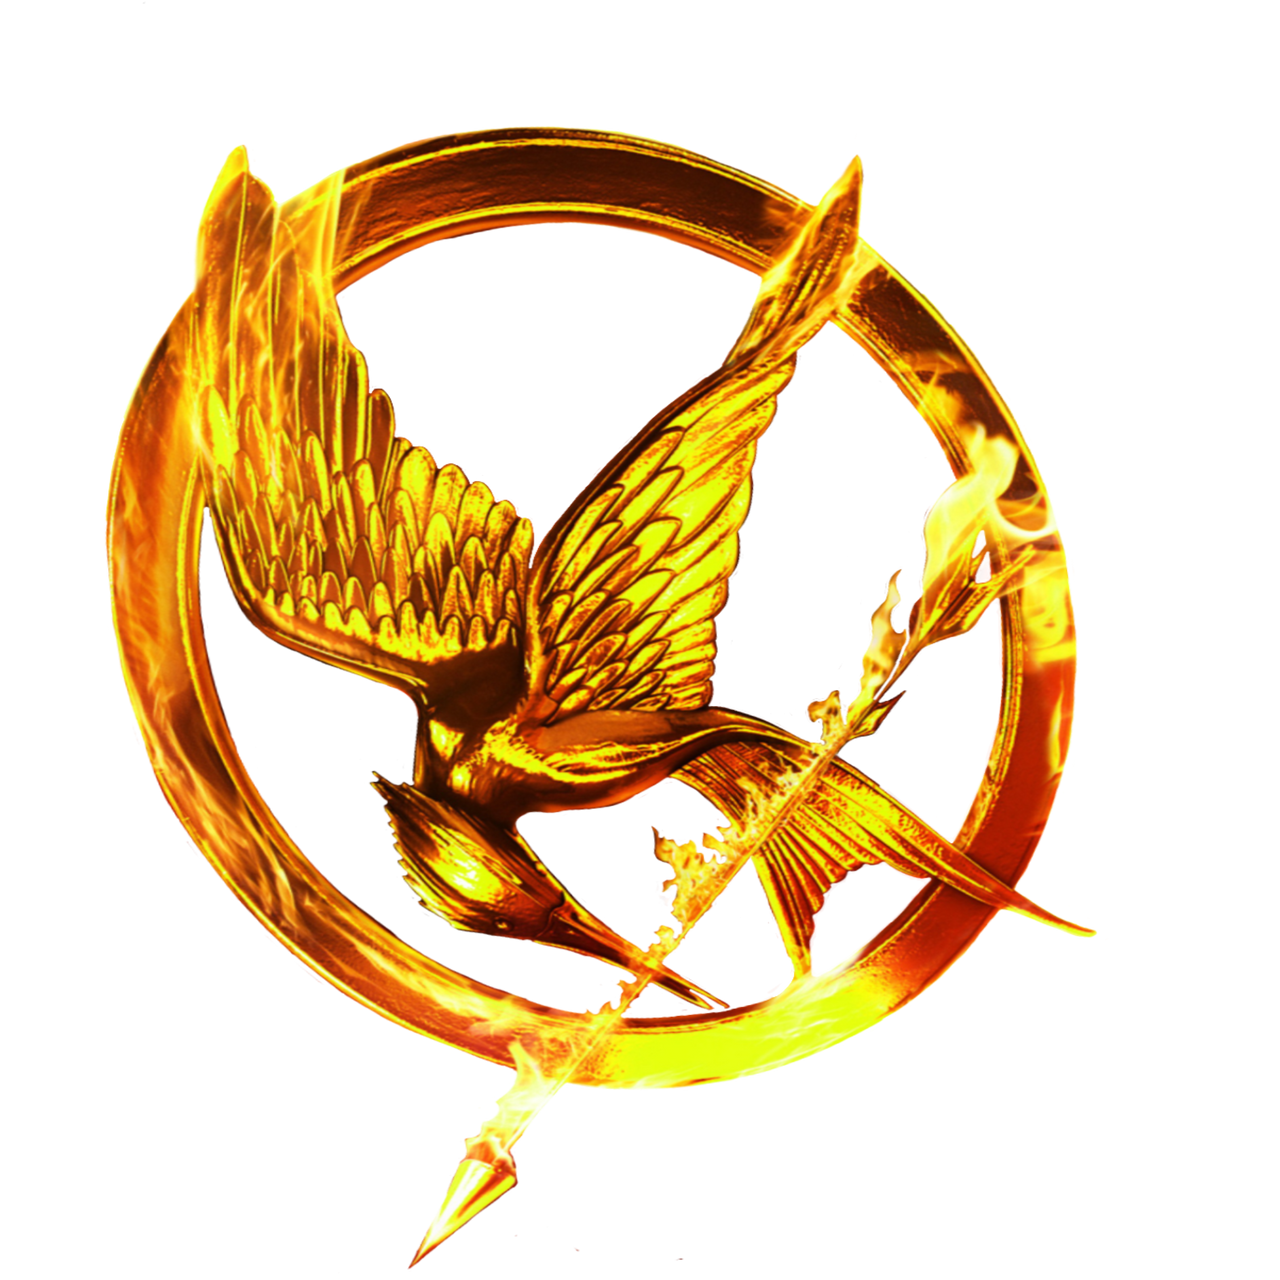 the hunger games movie logo ring by allheartsgoboom on